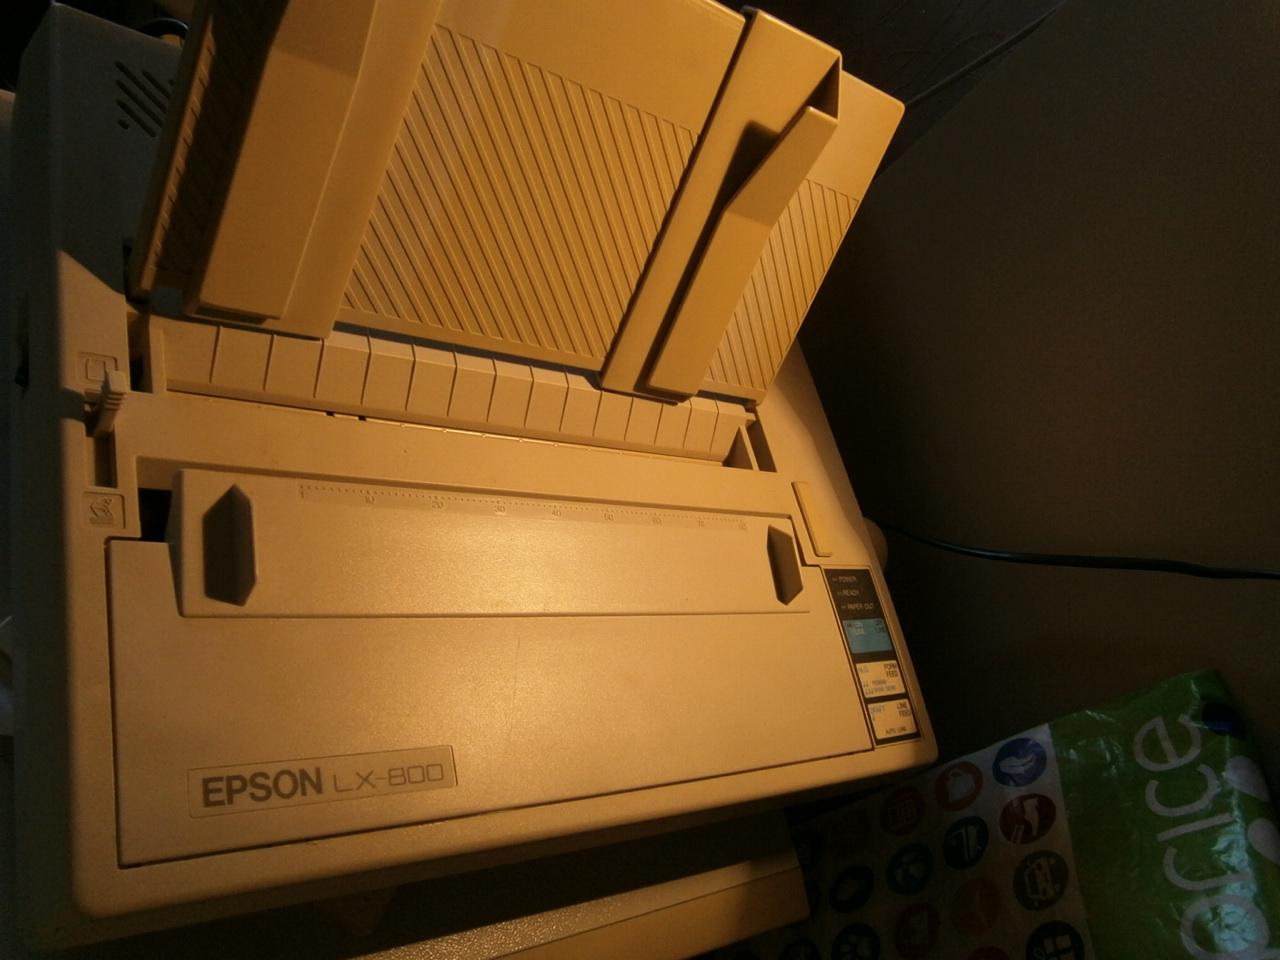 epson lx800